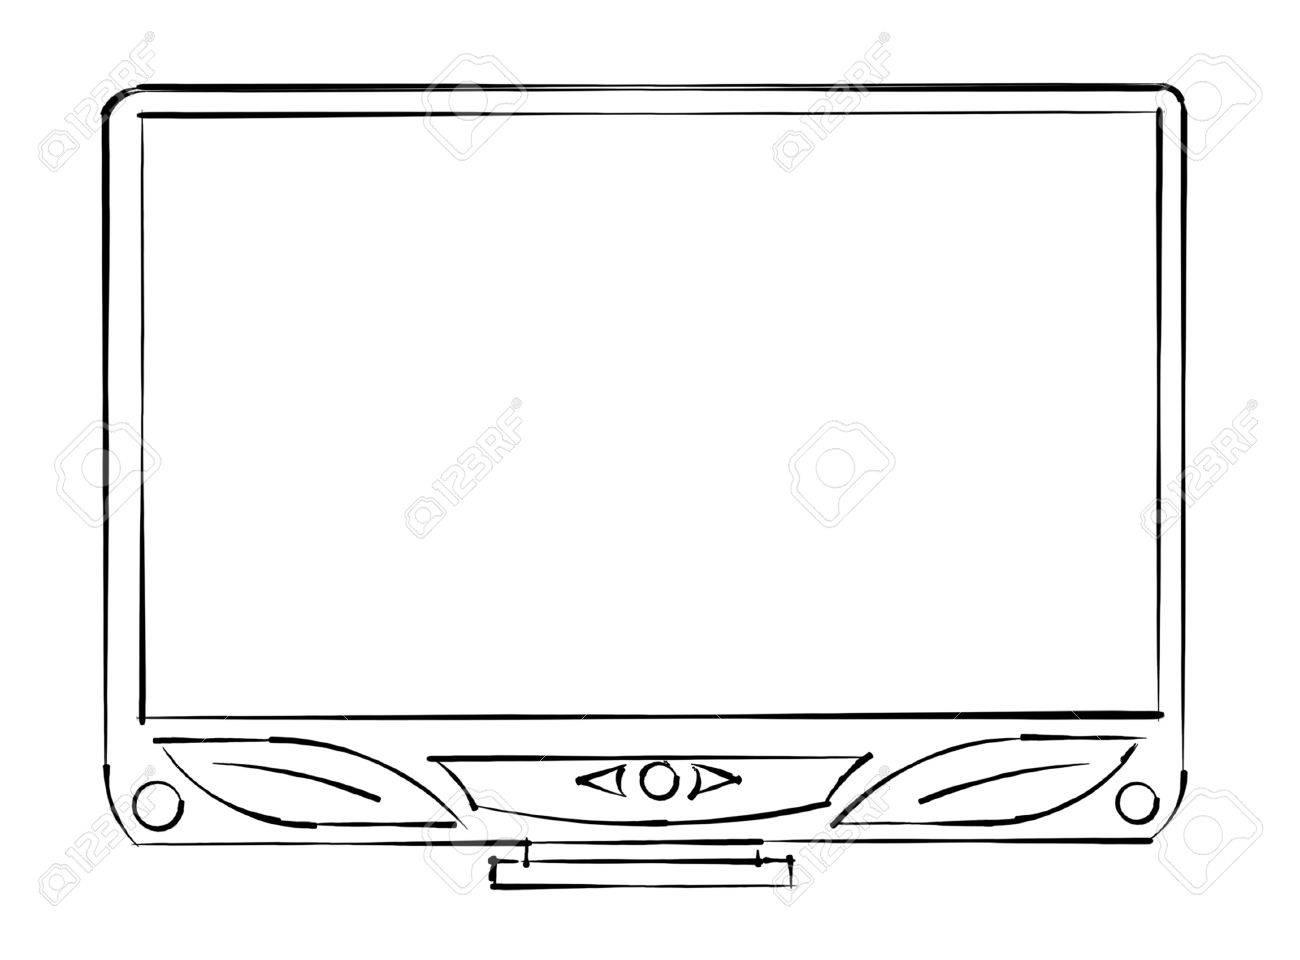 tv sketch monitor Stock Photo - 13533164